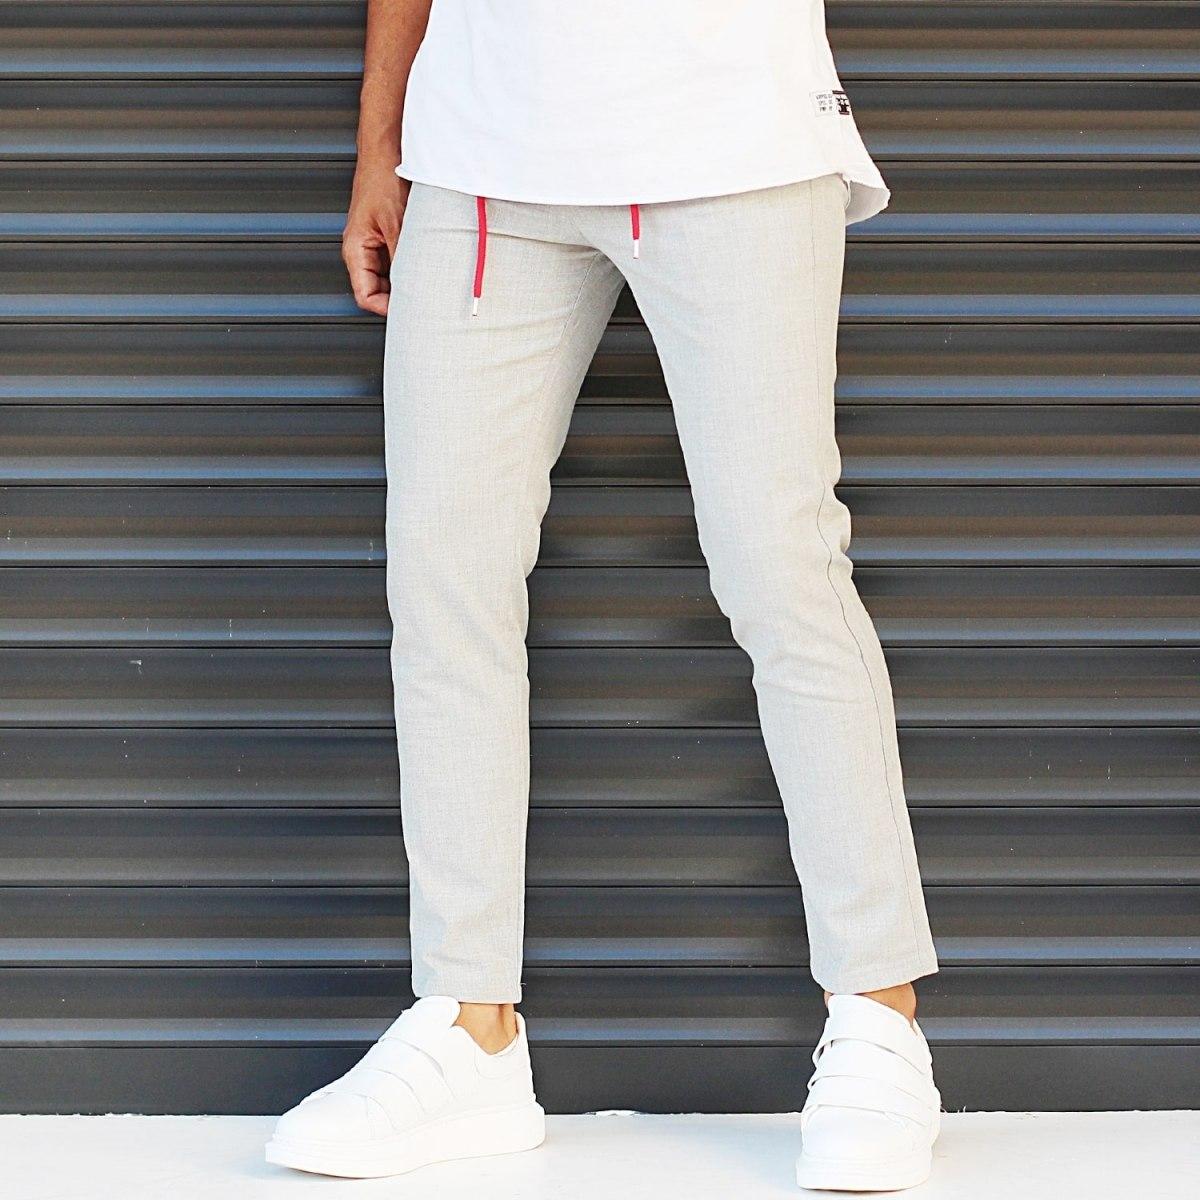 Men's Slim Fit Lycra Sport Pants Cream Mv Premium Brand - 2